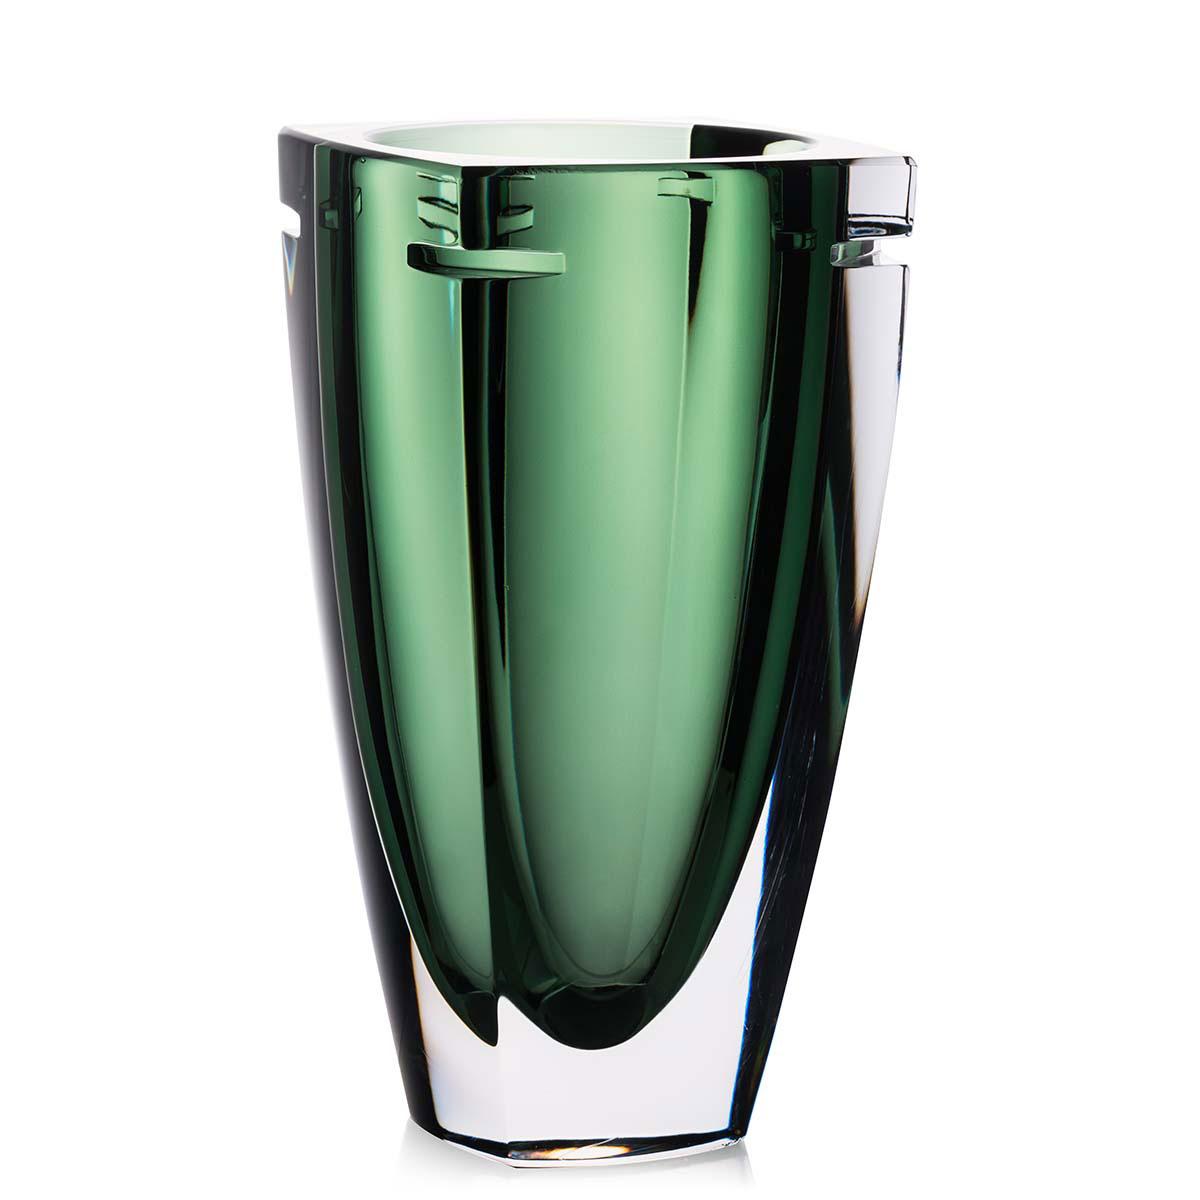 "Waterford Crystal, W Fern 10"" Crystal Vase"